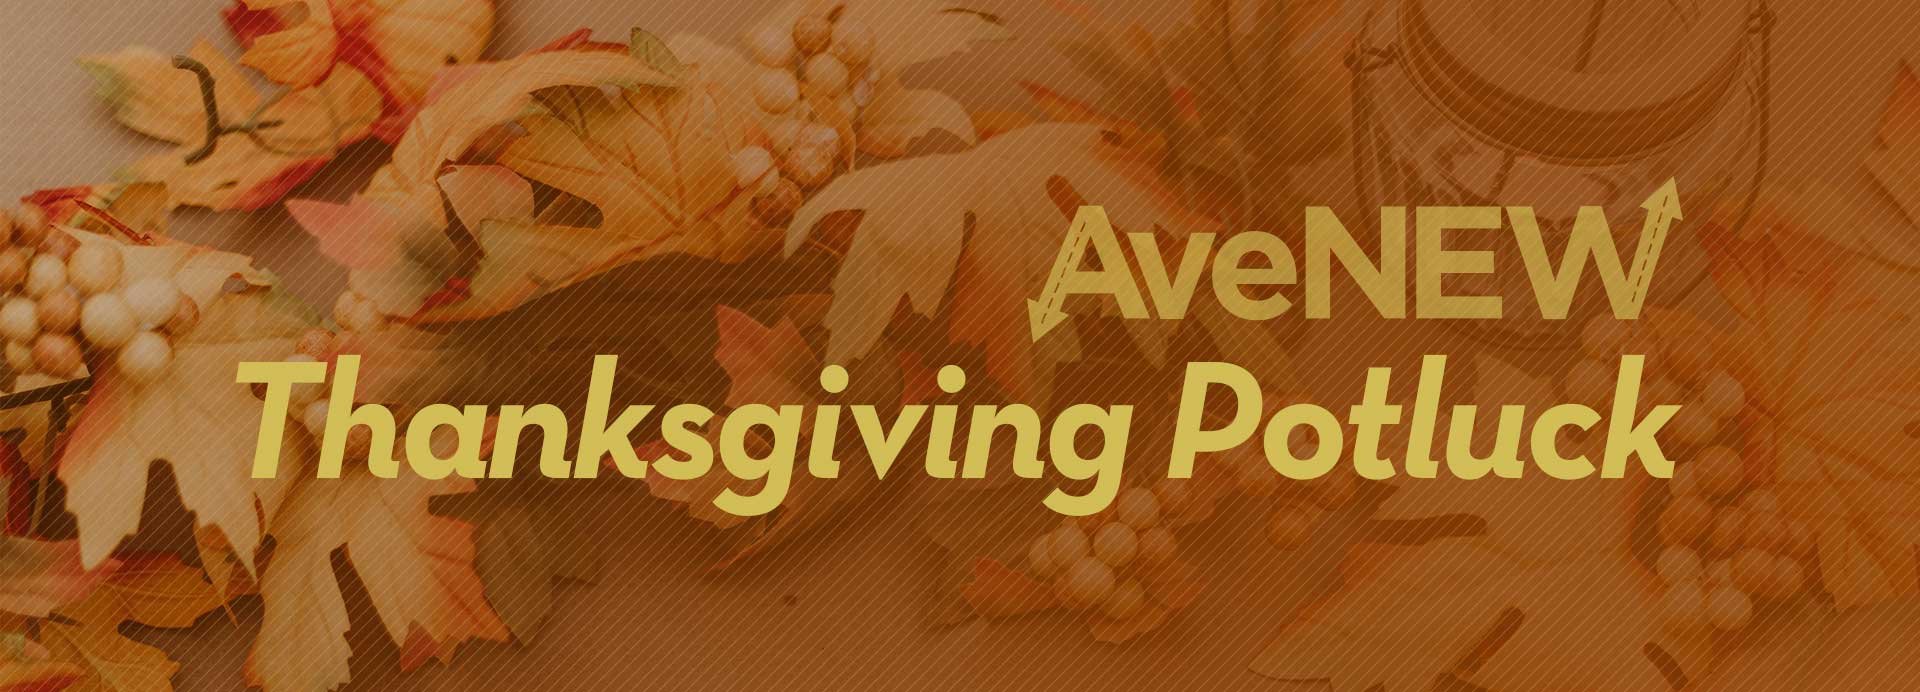 Avenew_ThanksgivingPotluck_1090x692.jpg